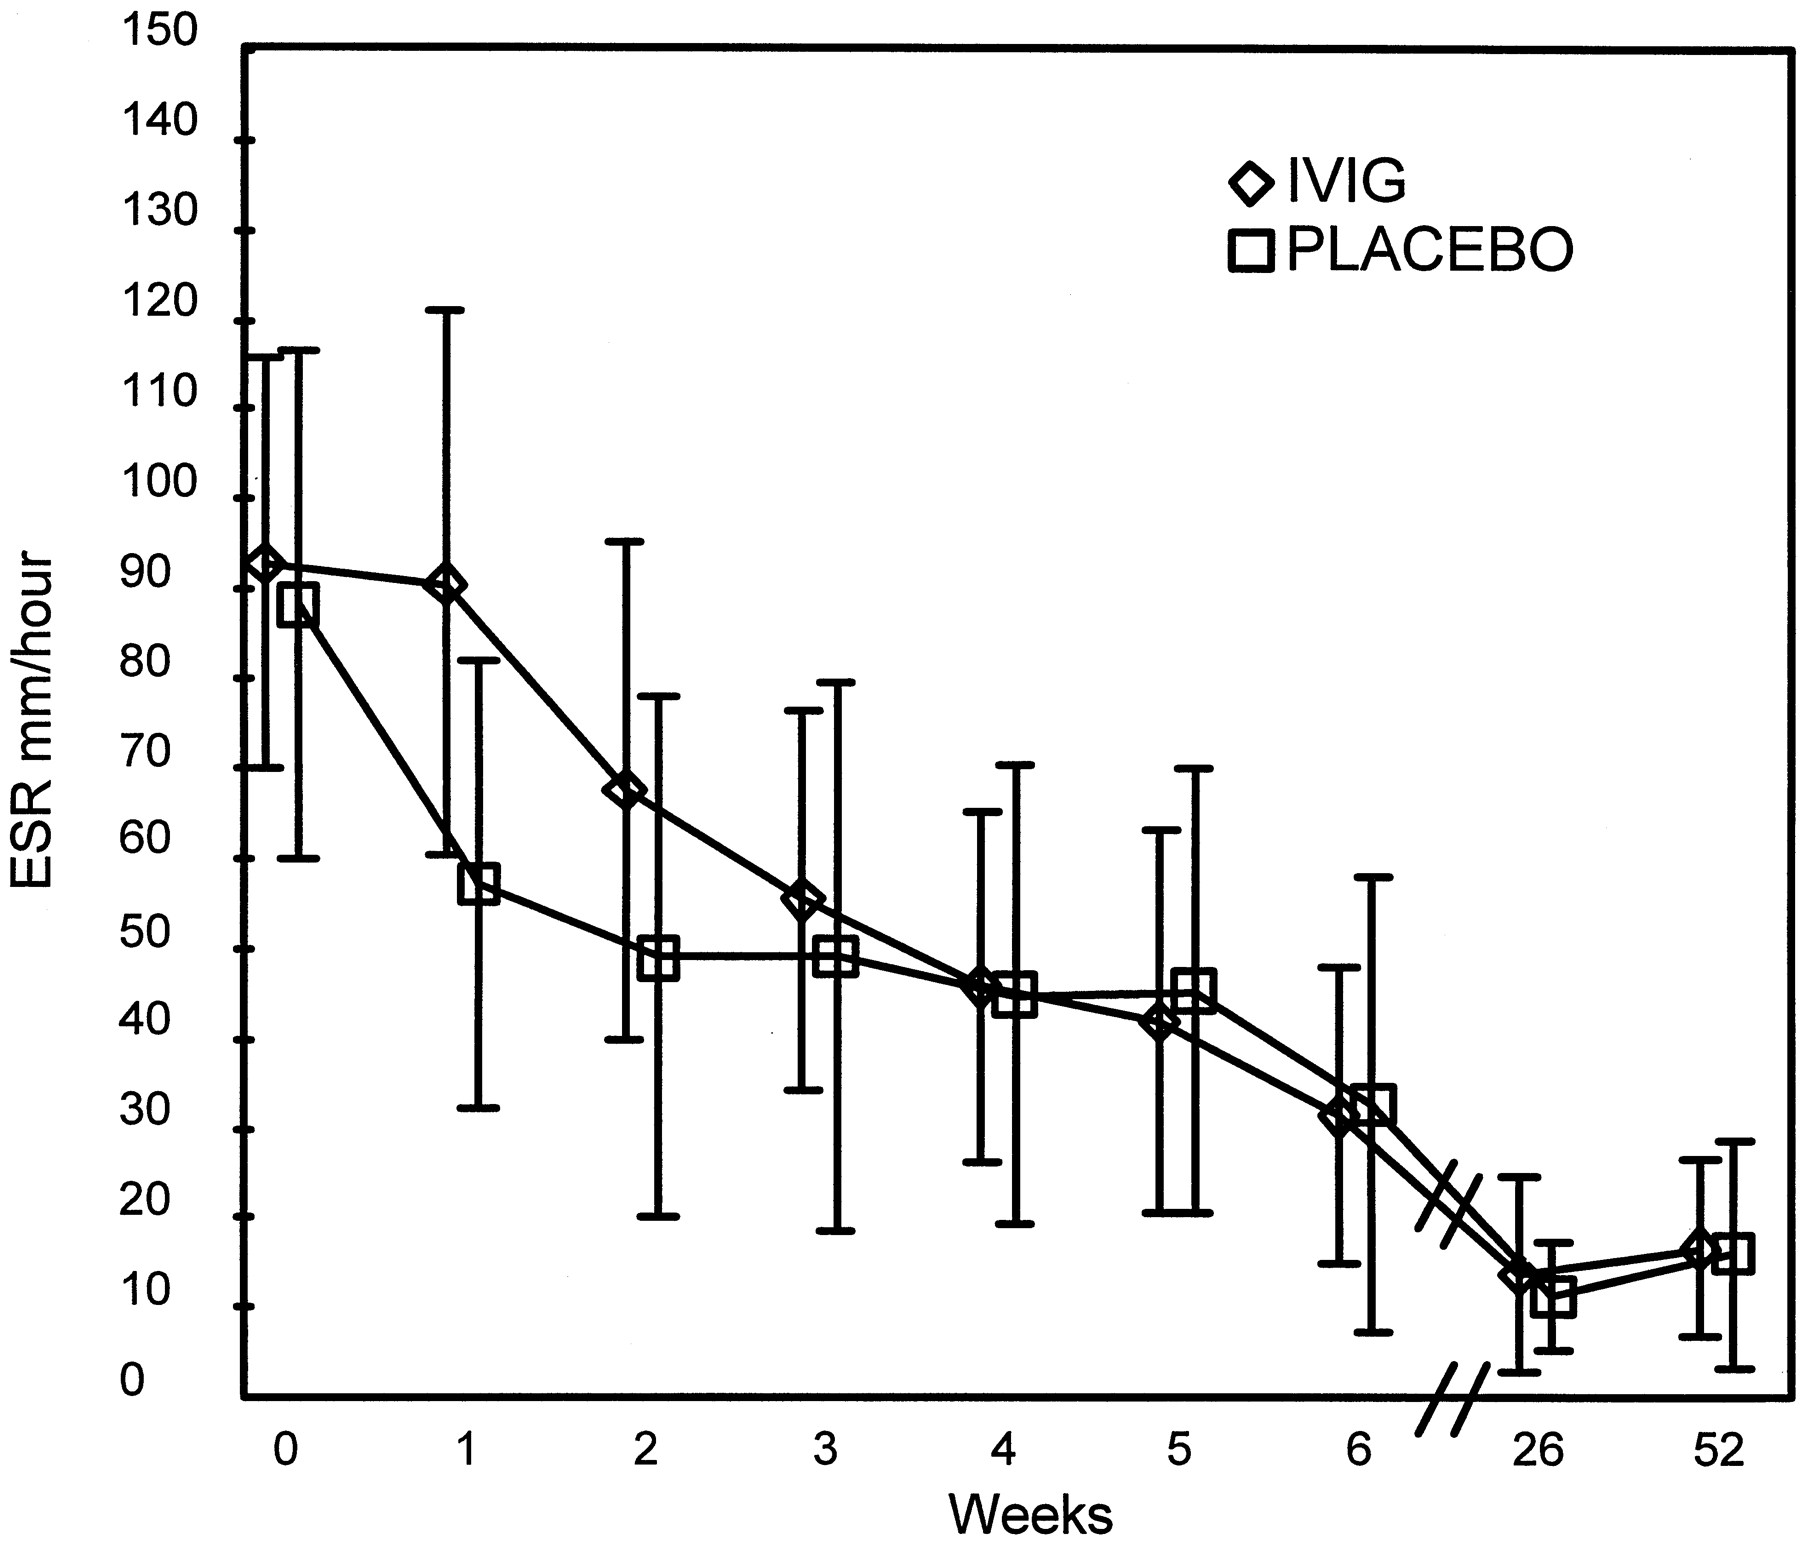 Intravenous Immunoglobulin in Acute Rheumatic Fever